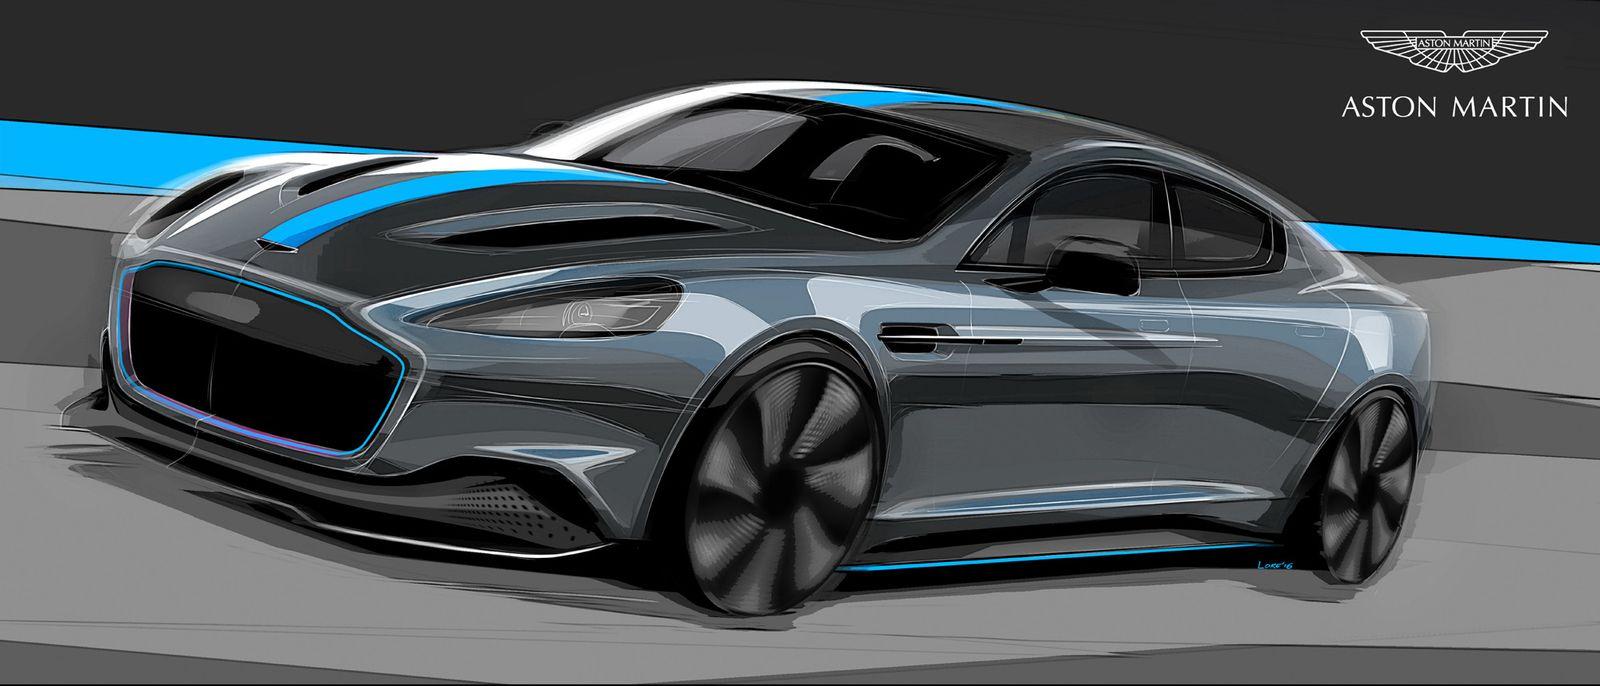 Aston Martin / Rapide